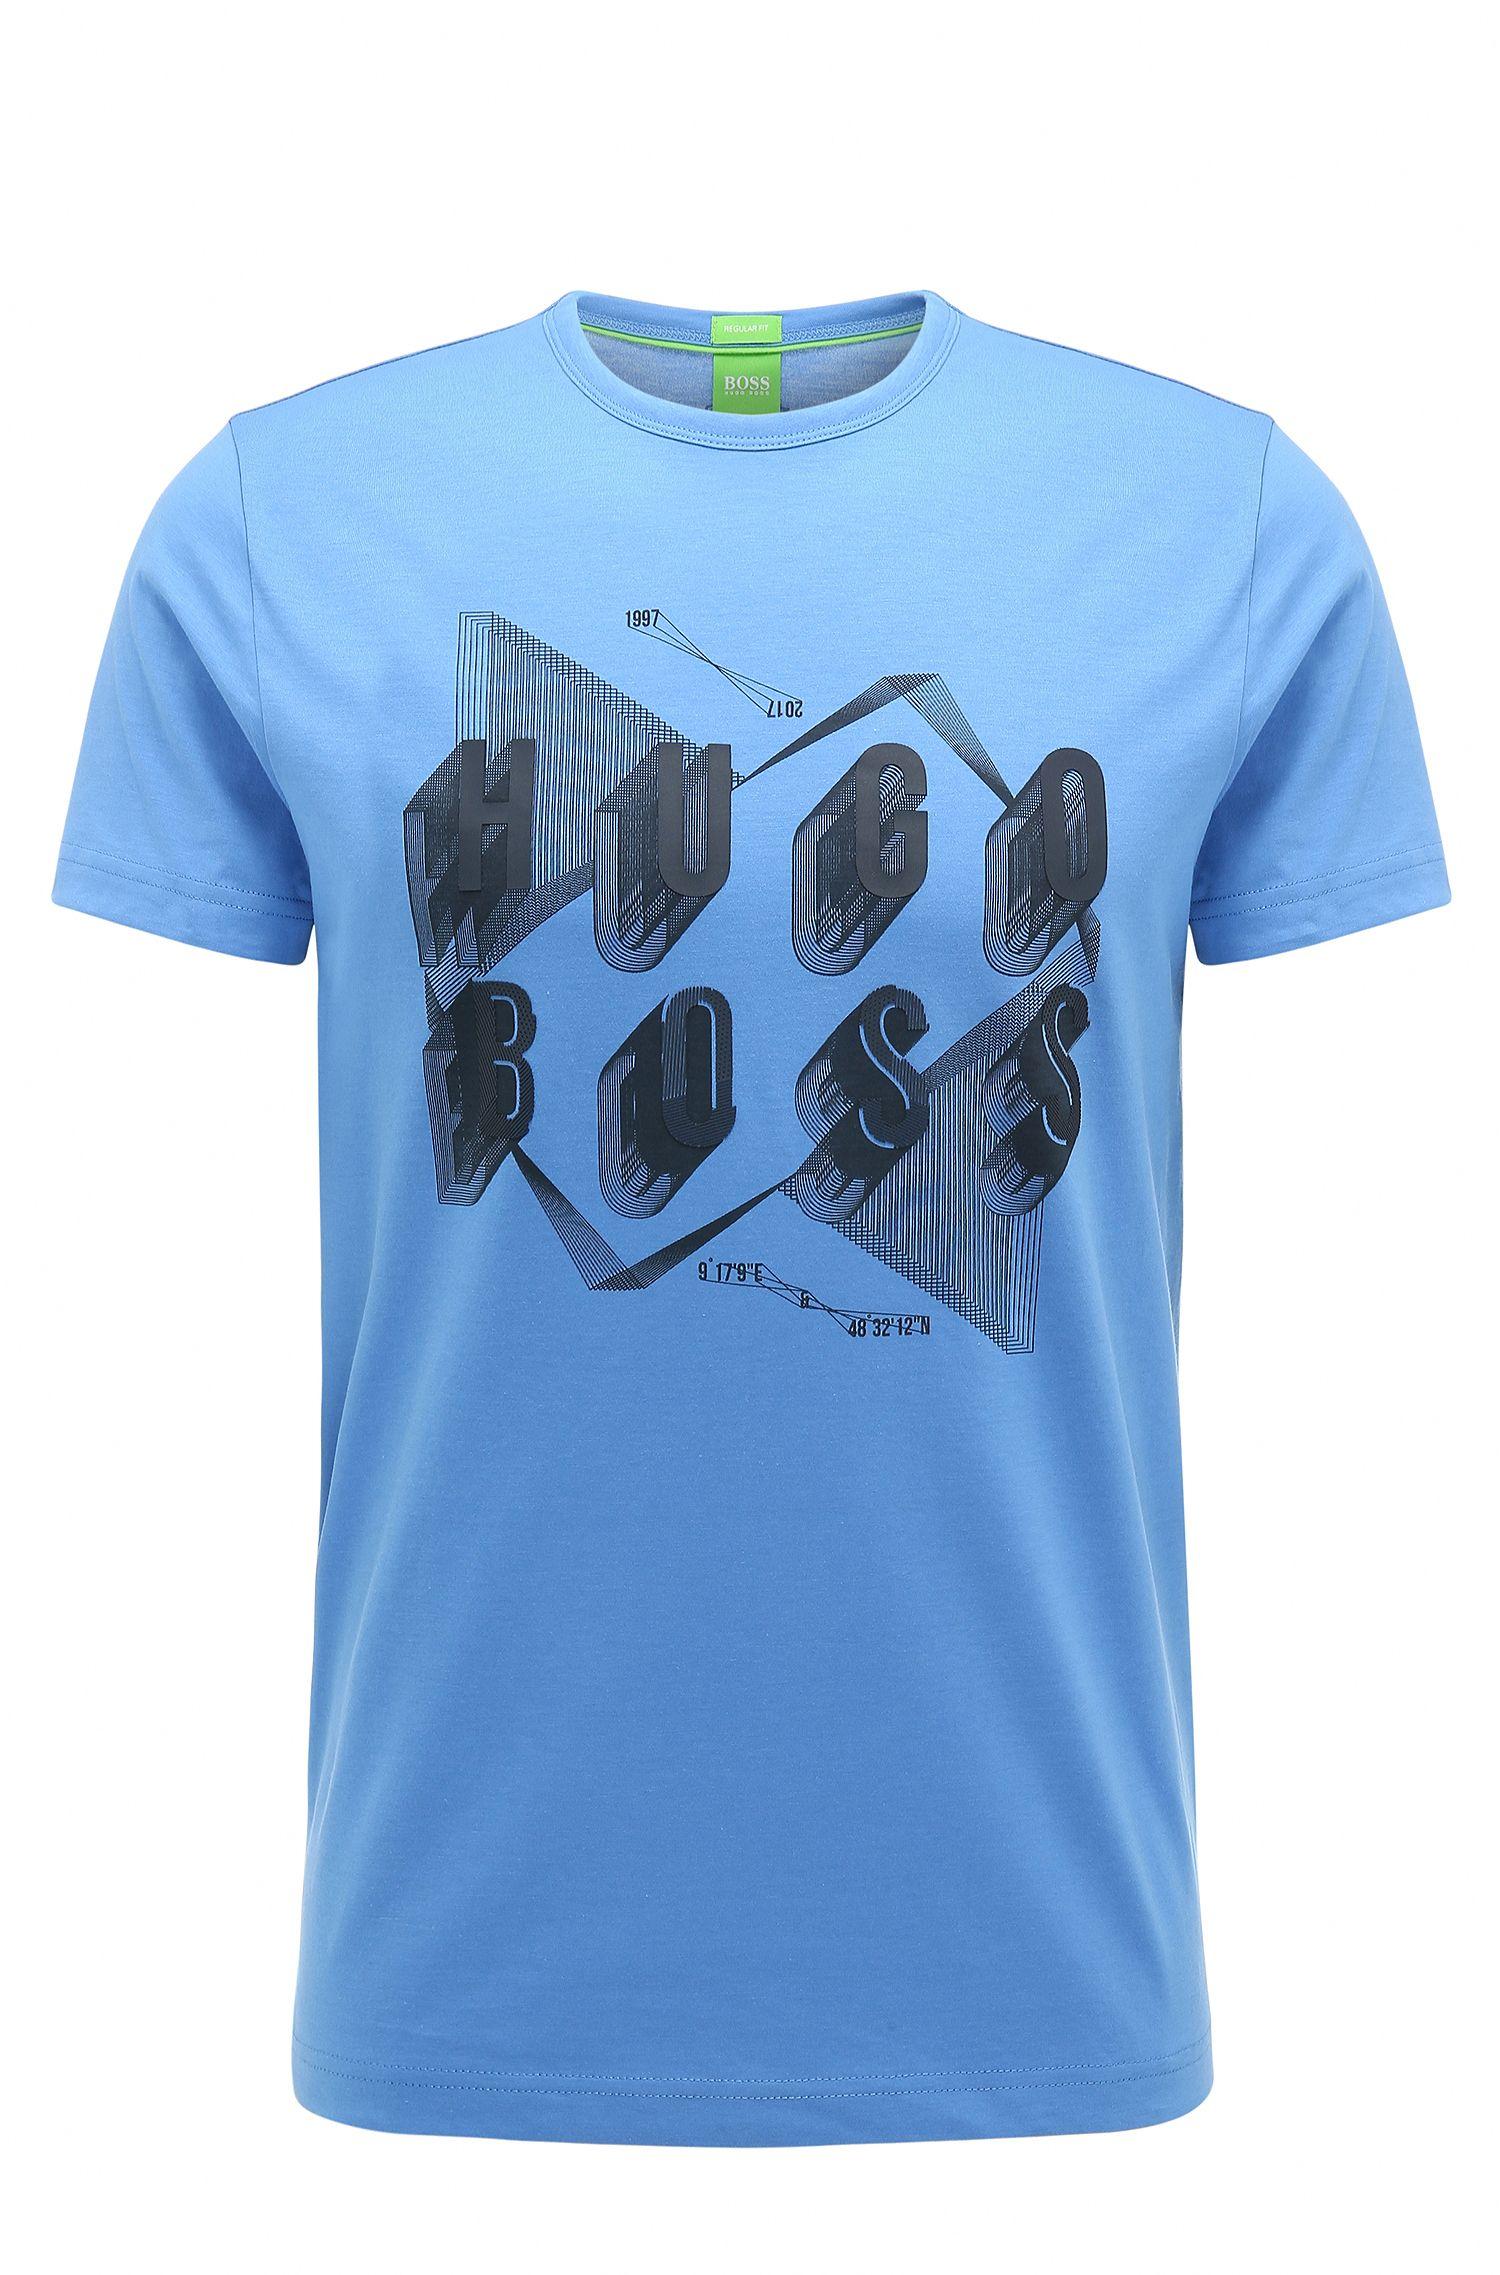 Cotton Graphic T-Shirt   Teeos